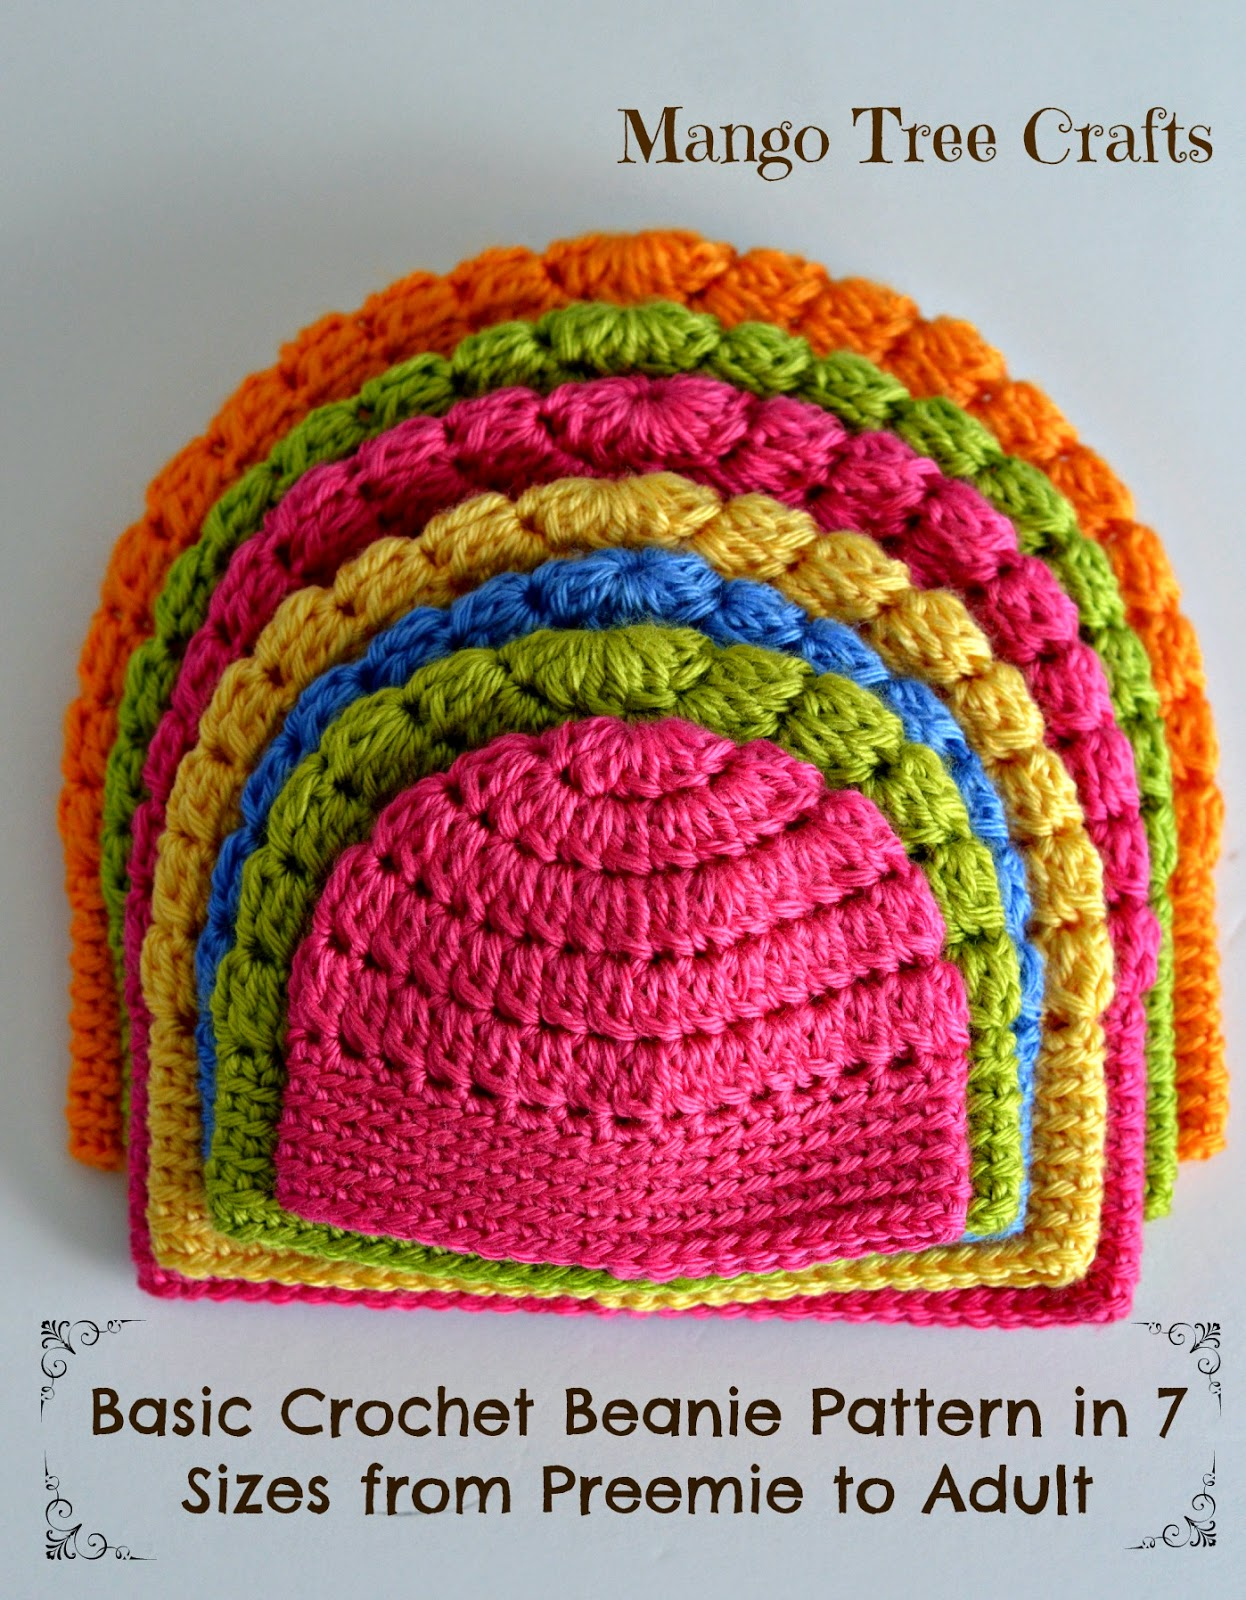 Crochet: 10 proyectos sencillos | MyHouseTuCasa.com